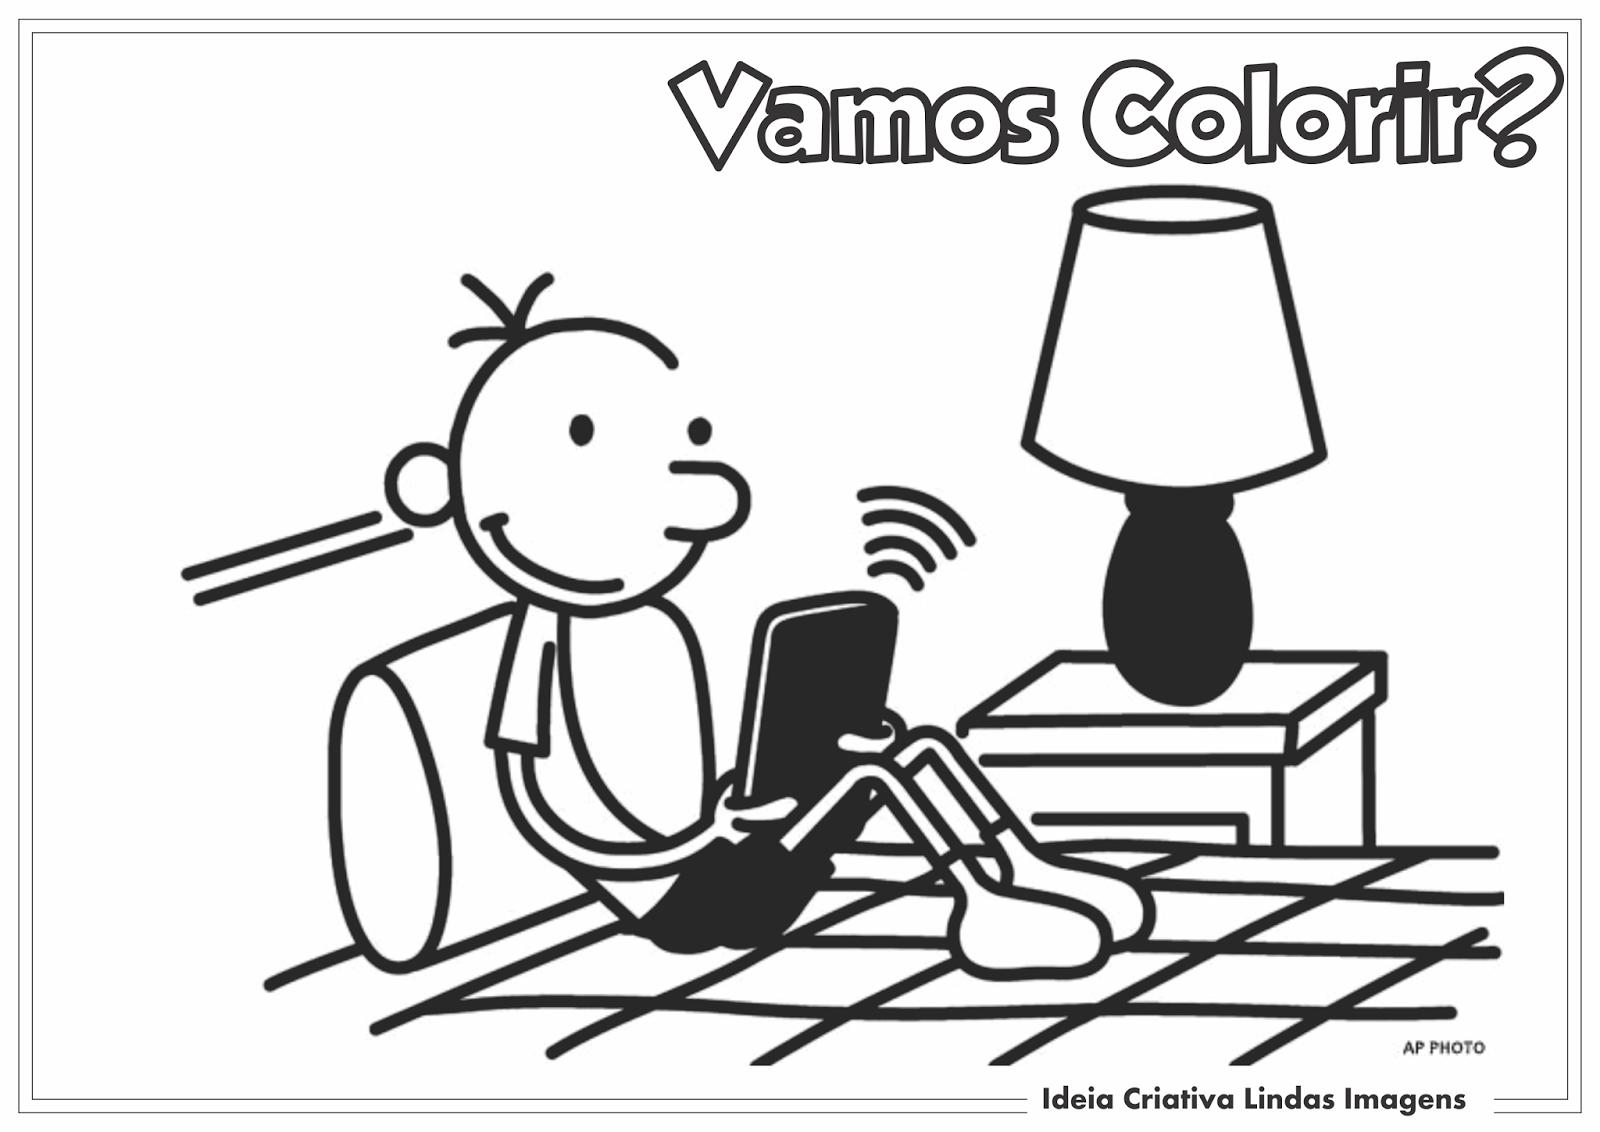 diario de um banana colorir - Pesquisa Google